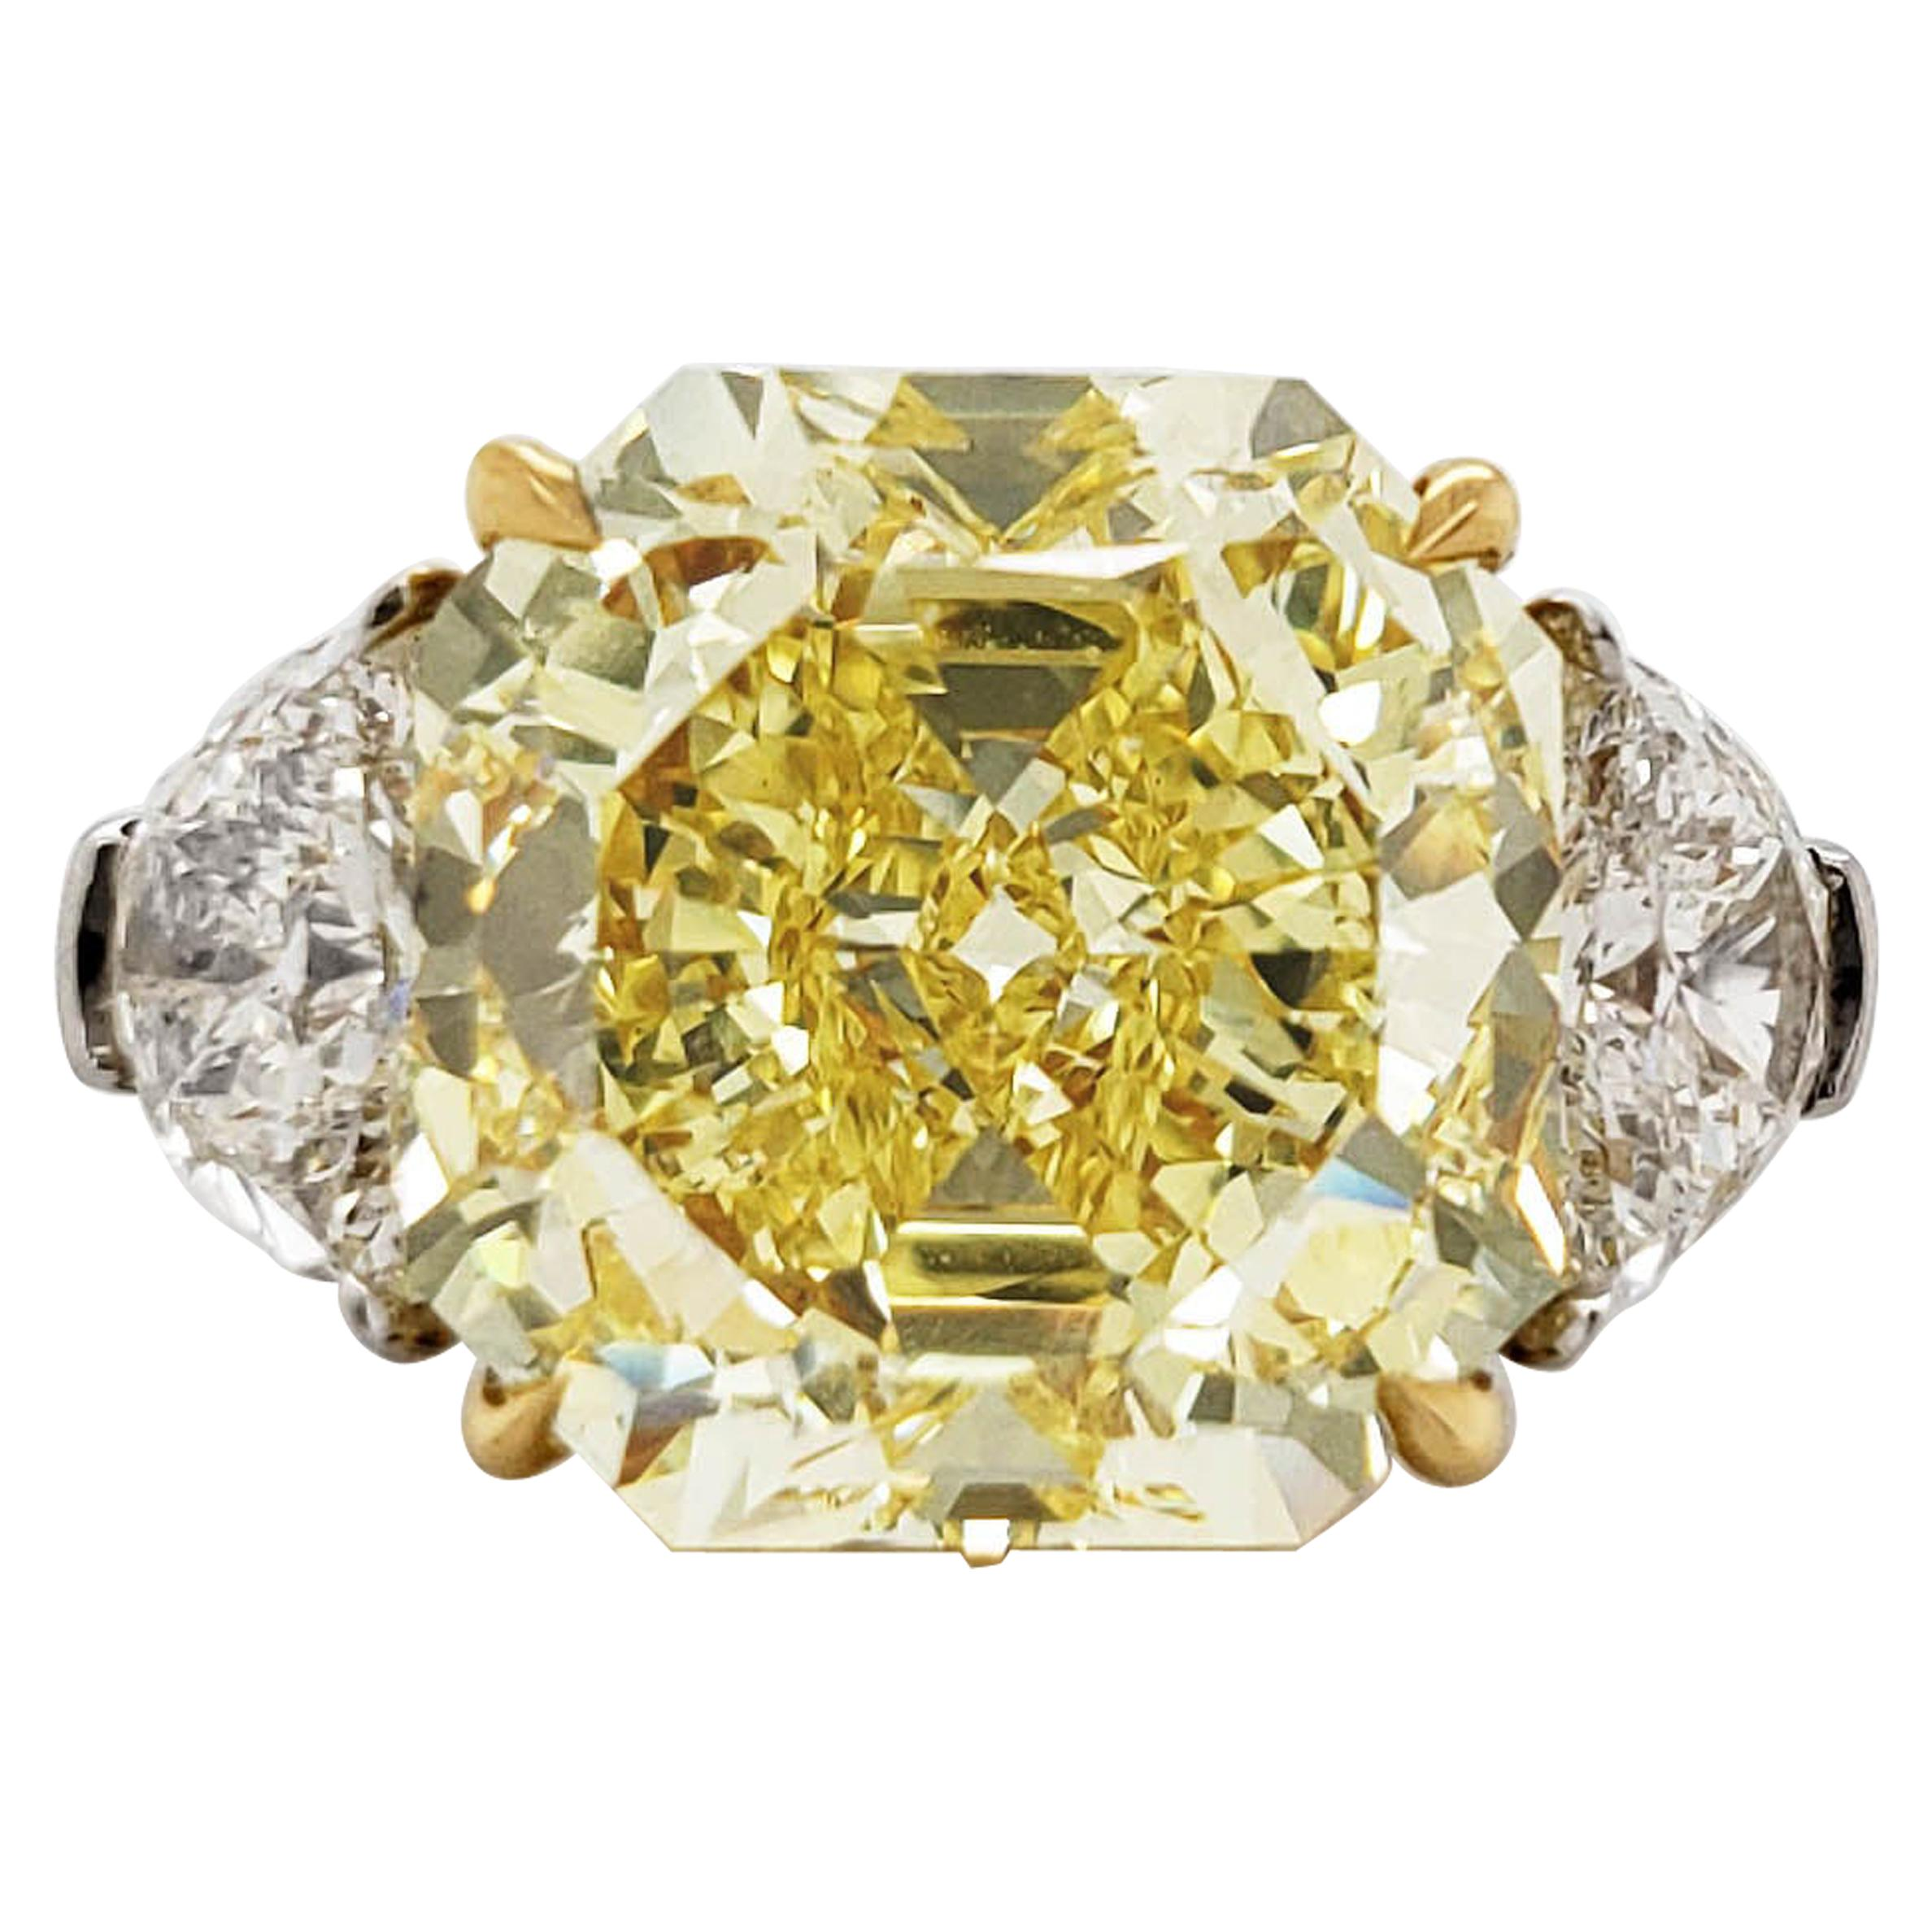 Scarselli 10 Carat Fancy Intense Yellow Internally Flawless Radiant Diamond Ring